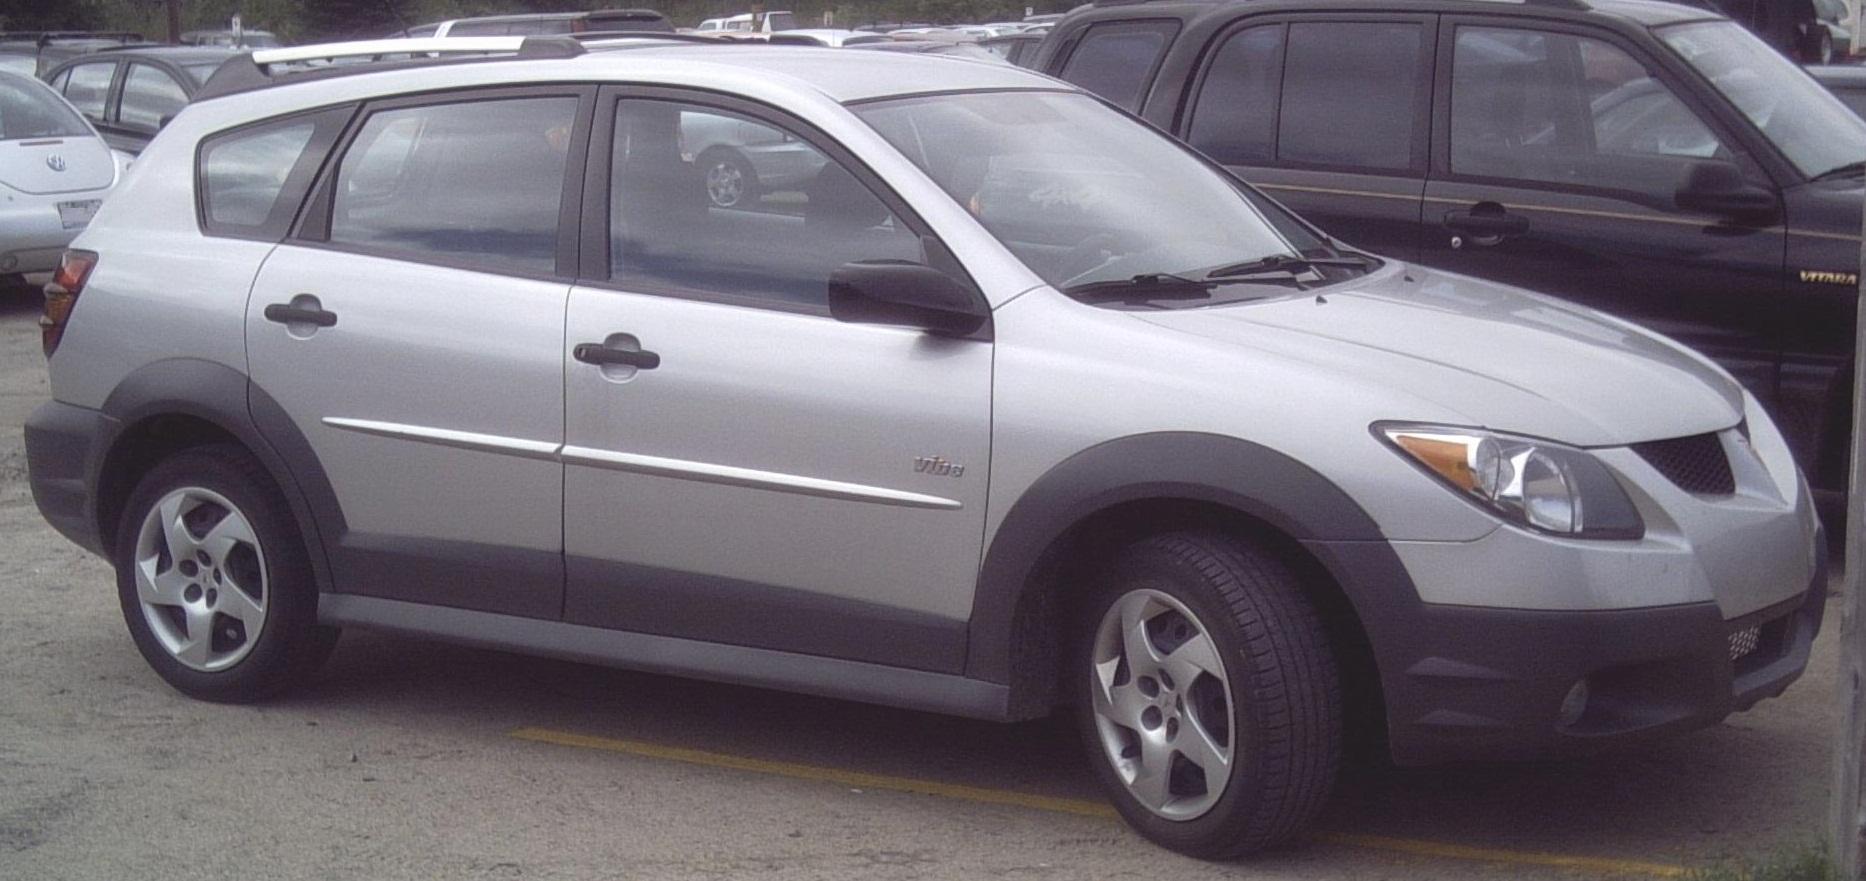 2003 pontiac vibe gt wagon 1 8l manual rh carspecs us pontiac vibe 2003 service manual 2003 pontiac vibe manual transmission for sale